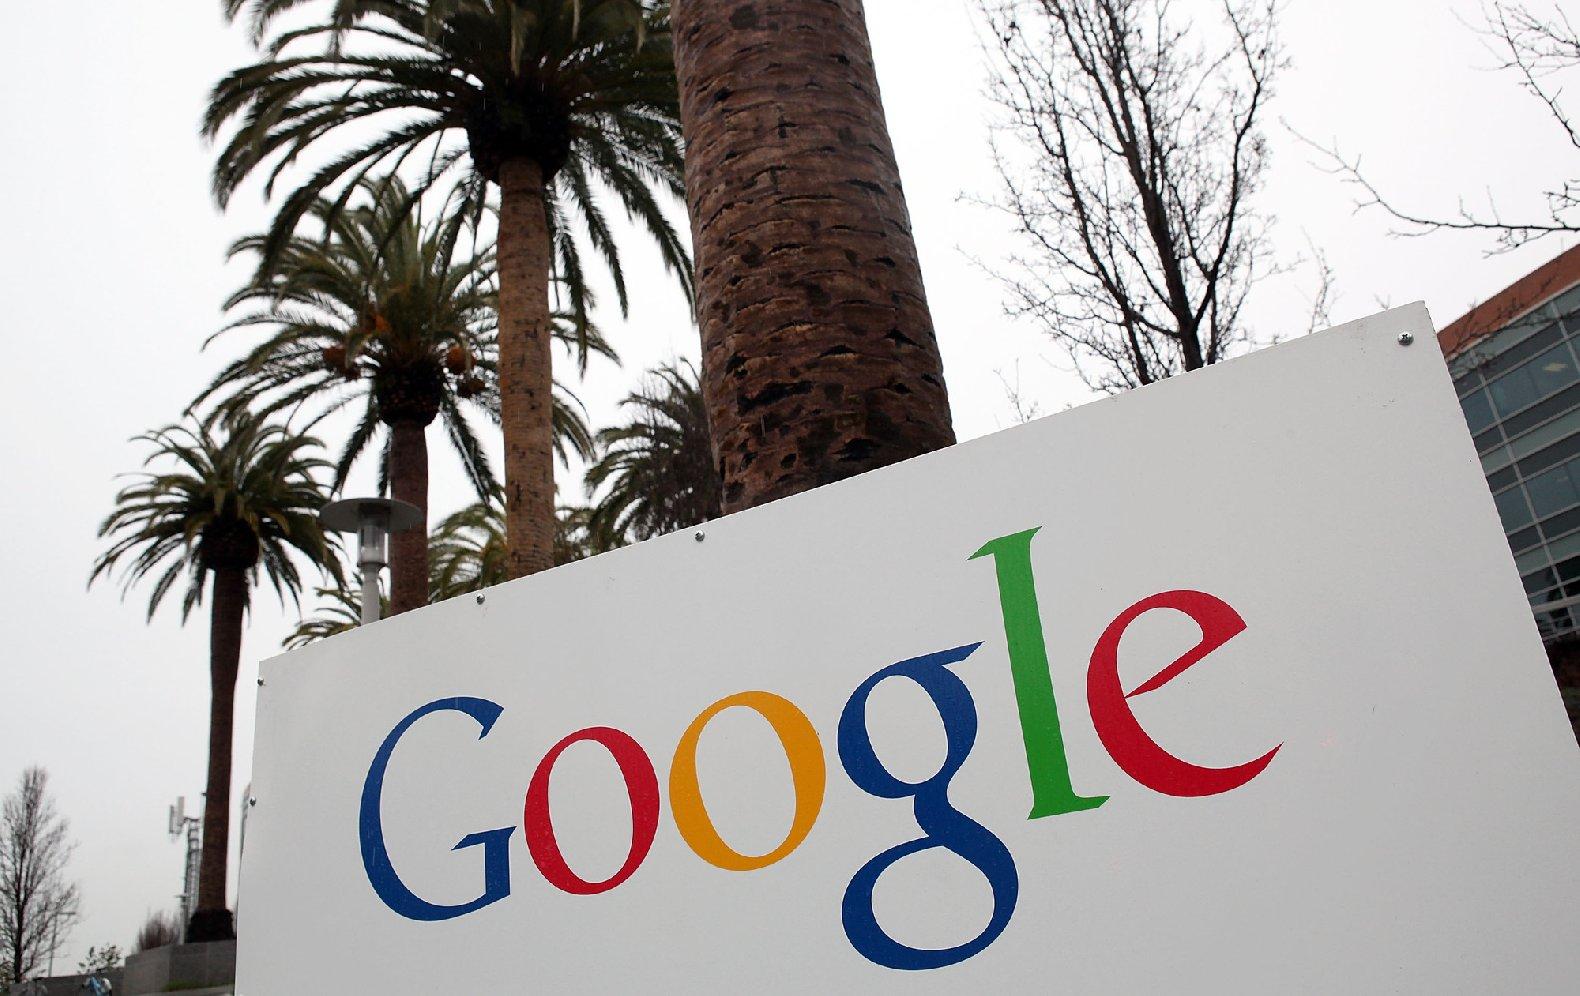 Google's 'Street View' Becomes a Wayback Machine